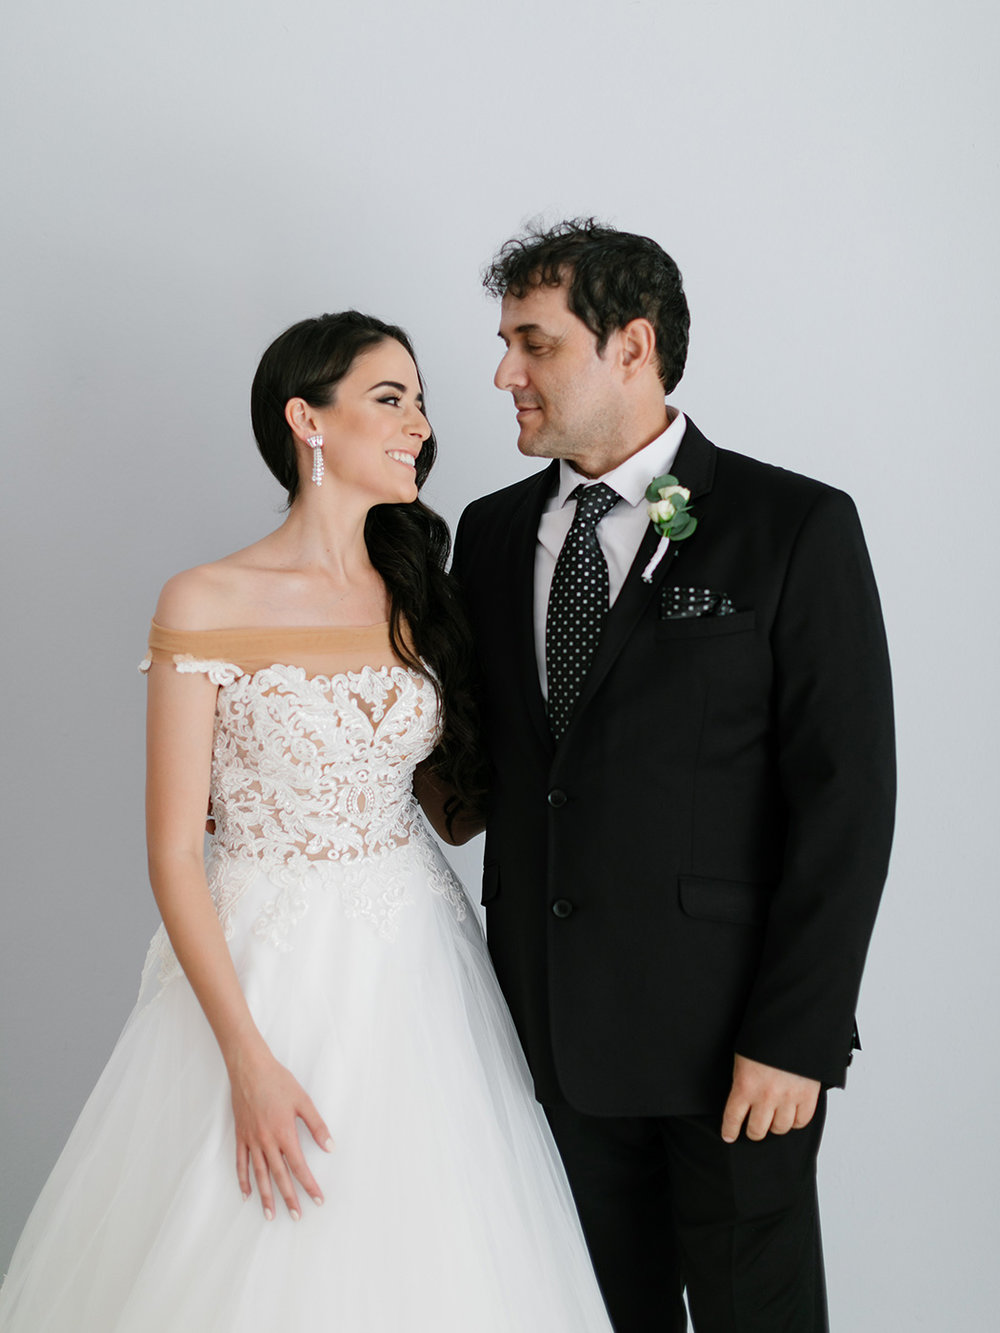 Father & Bride | Rensche Mari Photography